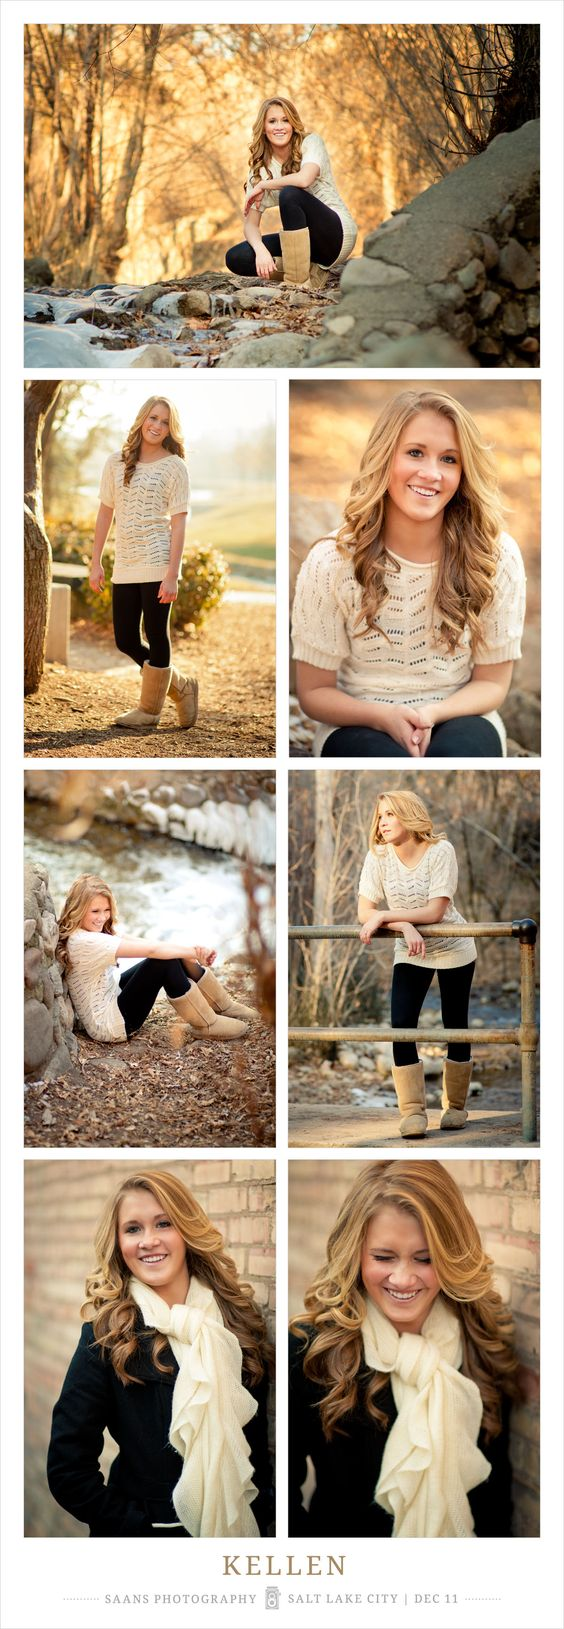 Senior Portraits | Saans Photography, Salt Lake City Utah | Gorgeous fall senior portraits in Utah, great color beautiful natural light